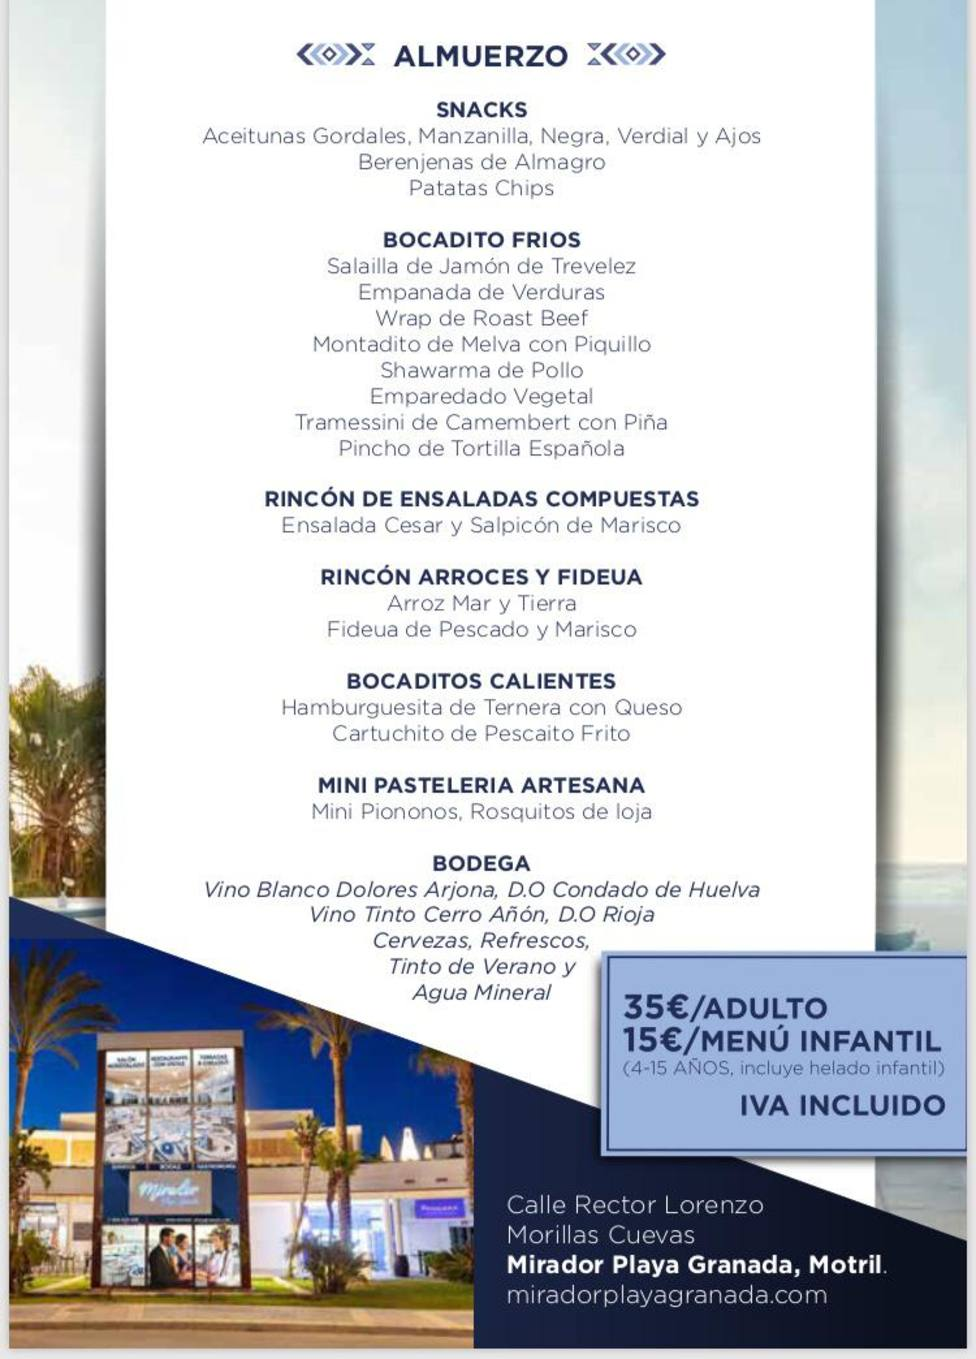 Mirador Playa Granada